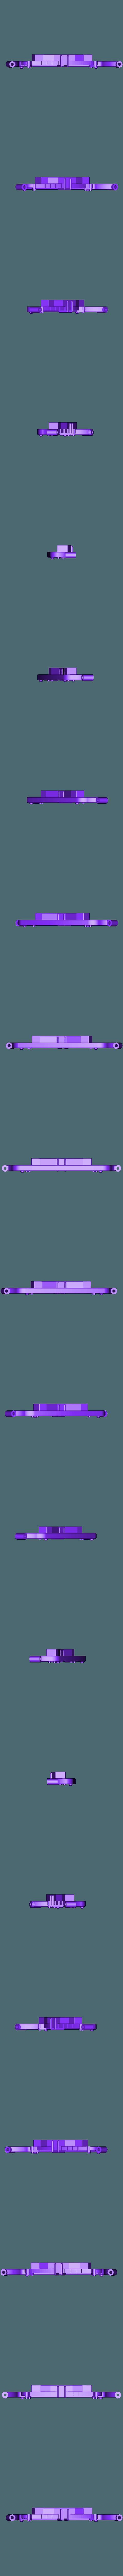 64TRK-drop axle.stl Download STL file Ratrod Pickup • 3D printing template, macone1